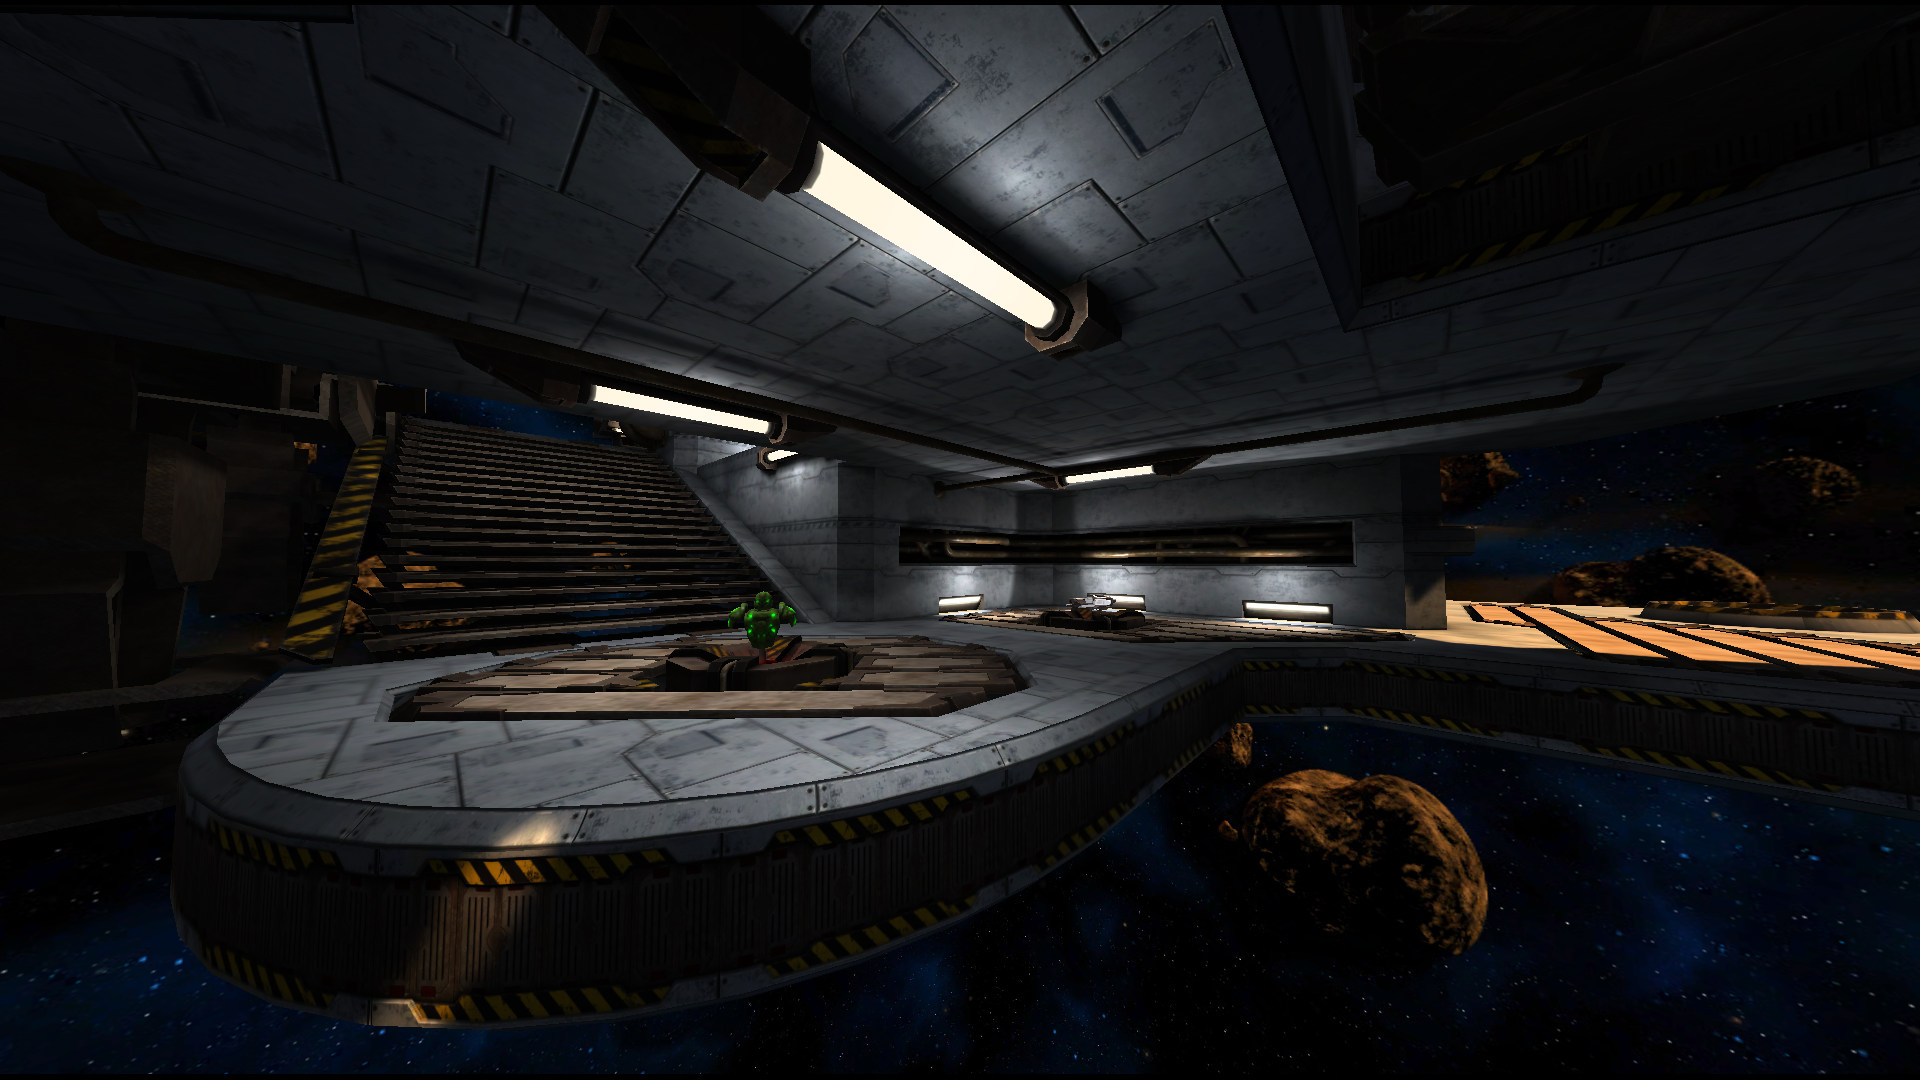 http://www.xonotic.org/m/uploads/2012/07/frontpage_026.jpg